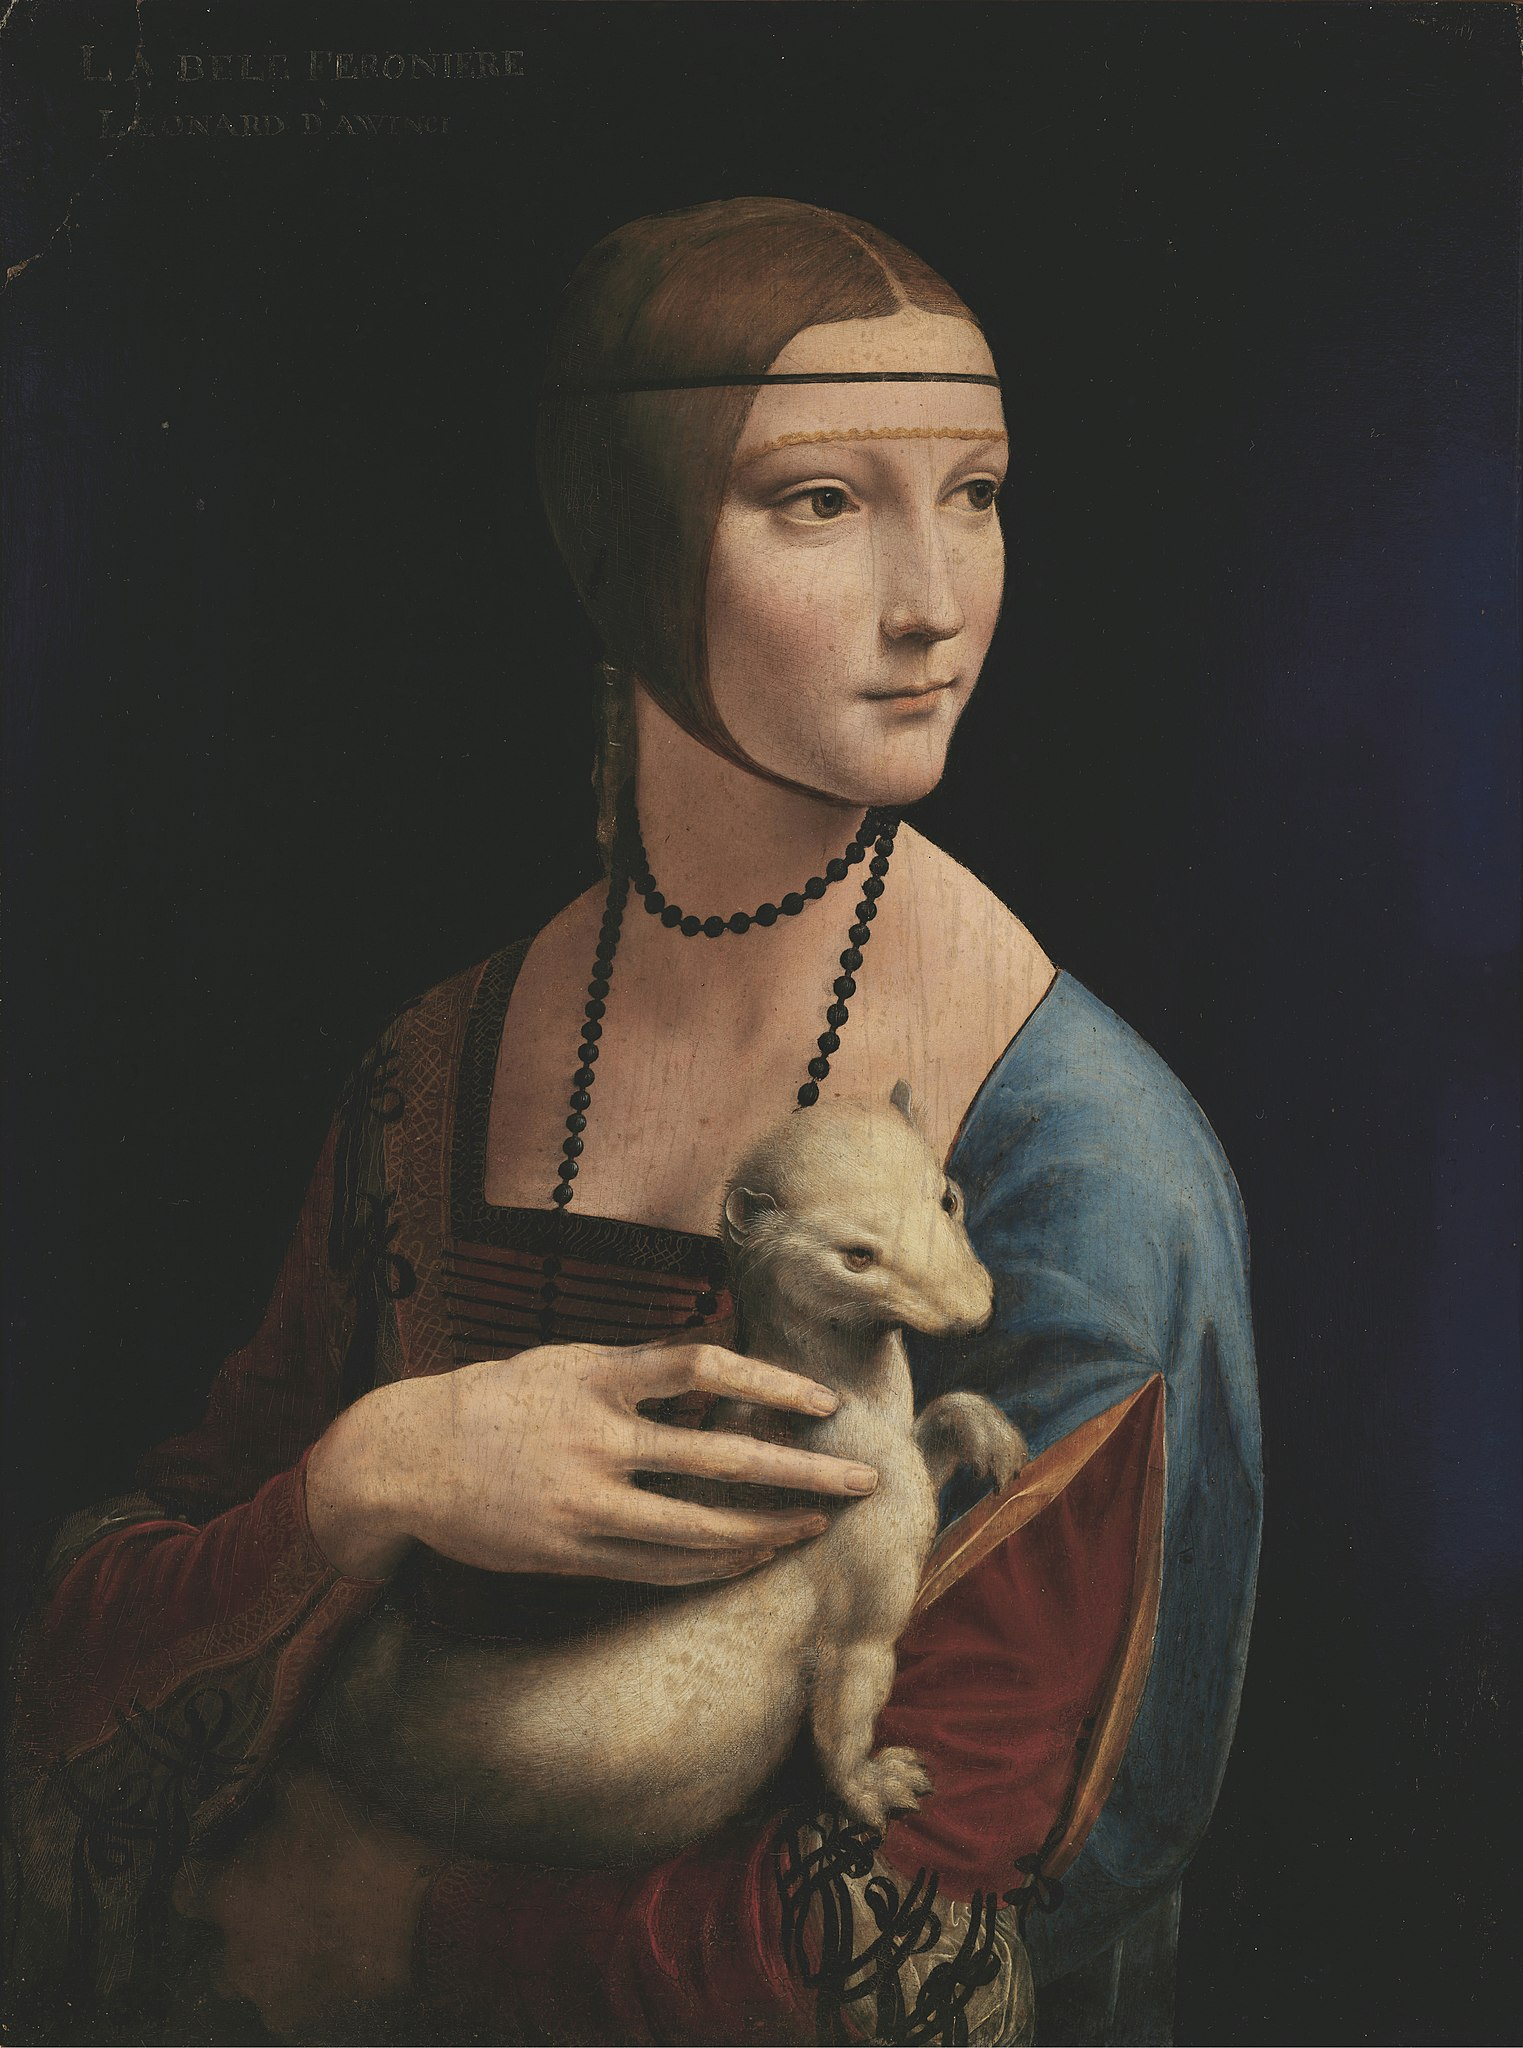 Imagen del cuadro La dama del Armiño de Leonardo Da Vinci